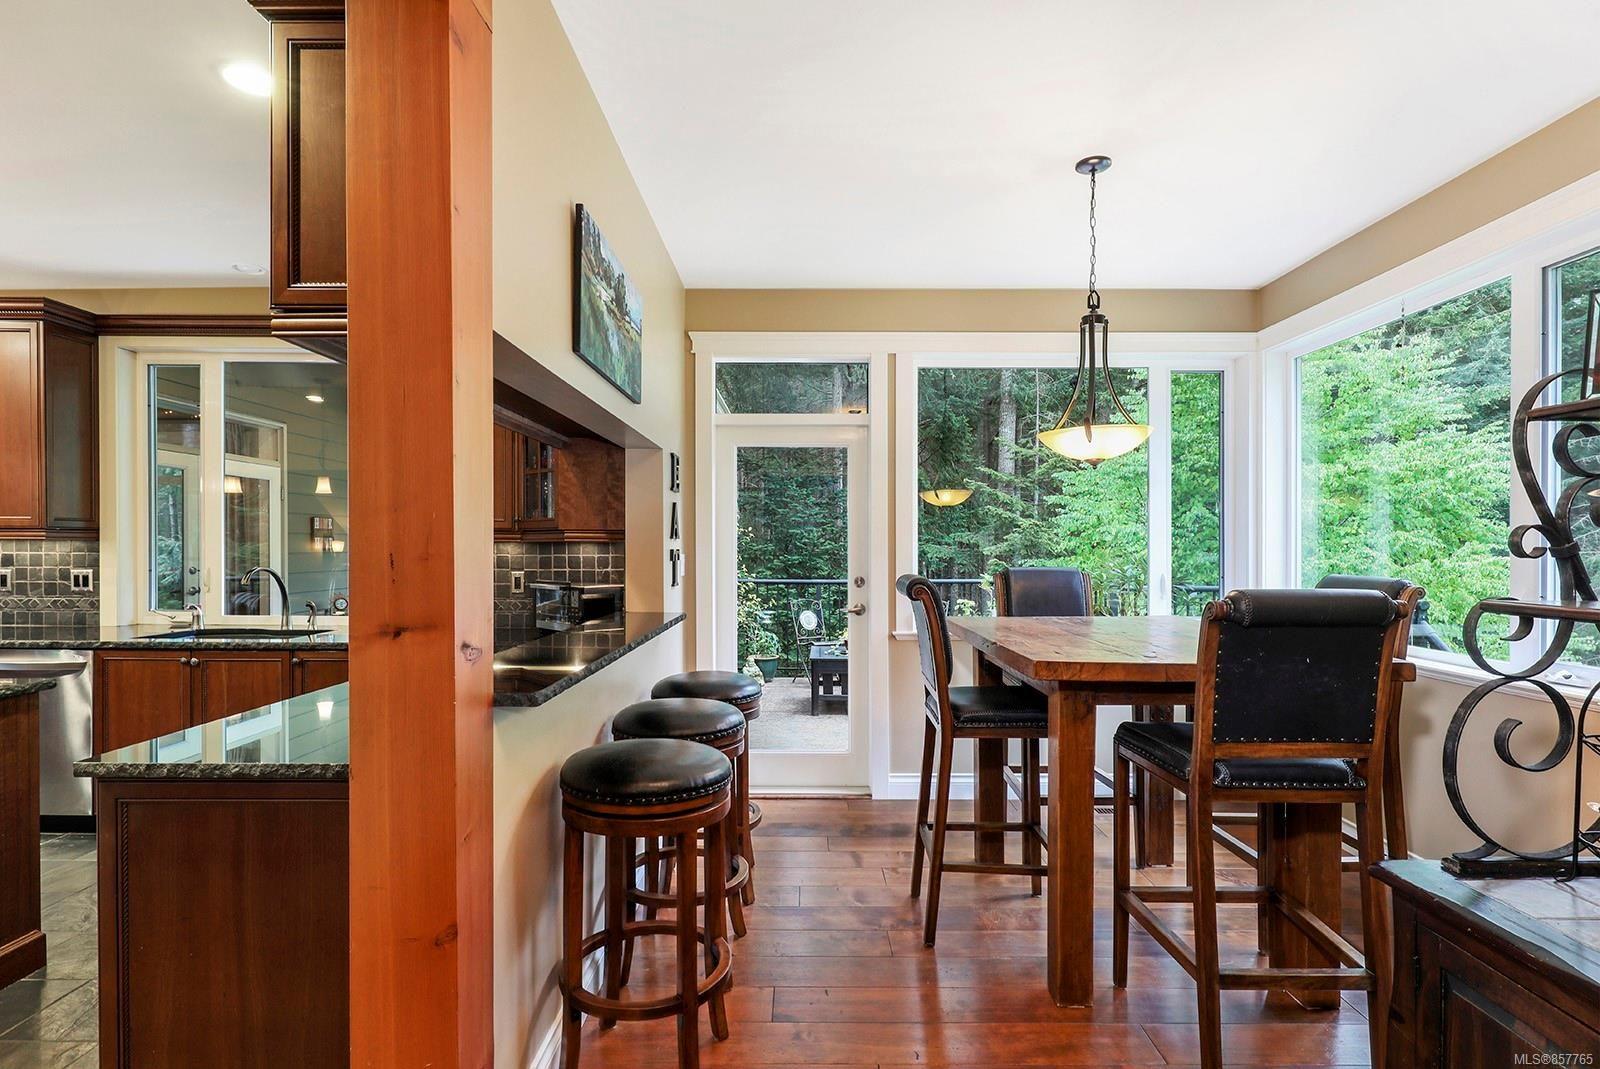 Photo 21: Photos: 1516 Highridge Dr in : CV Comox (Town of) House for sale (Comox Valley)  : MLS®# 857765